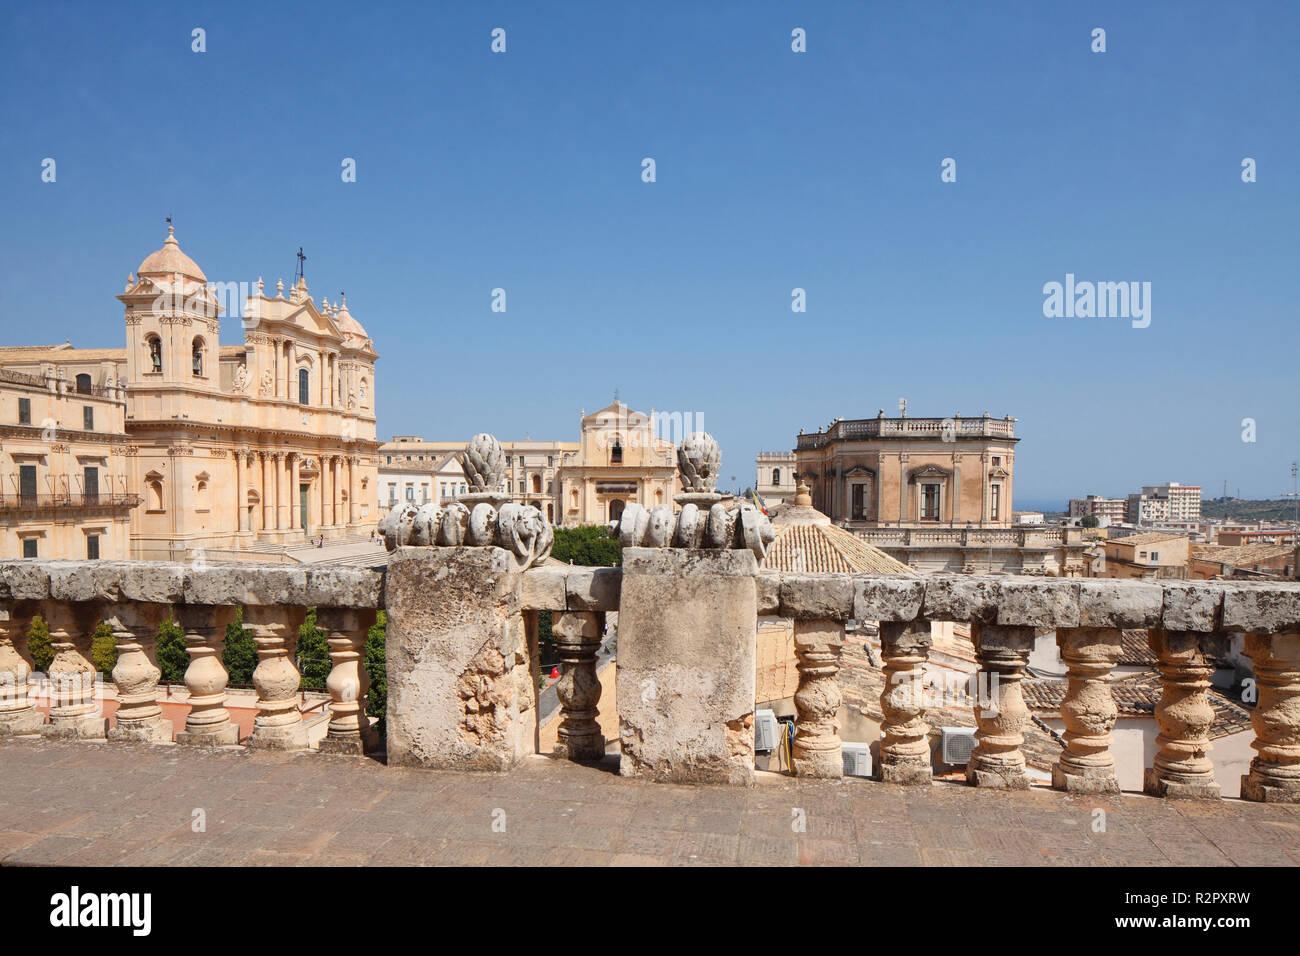 Noto Cathedral, Benedictine monastery of Santissimo Salvatore, Noto, UNESCO World Heritage cultural site, Val di Noto, Province of Syracuse, Sicily, Italy, Europe - Stock Image